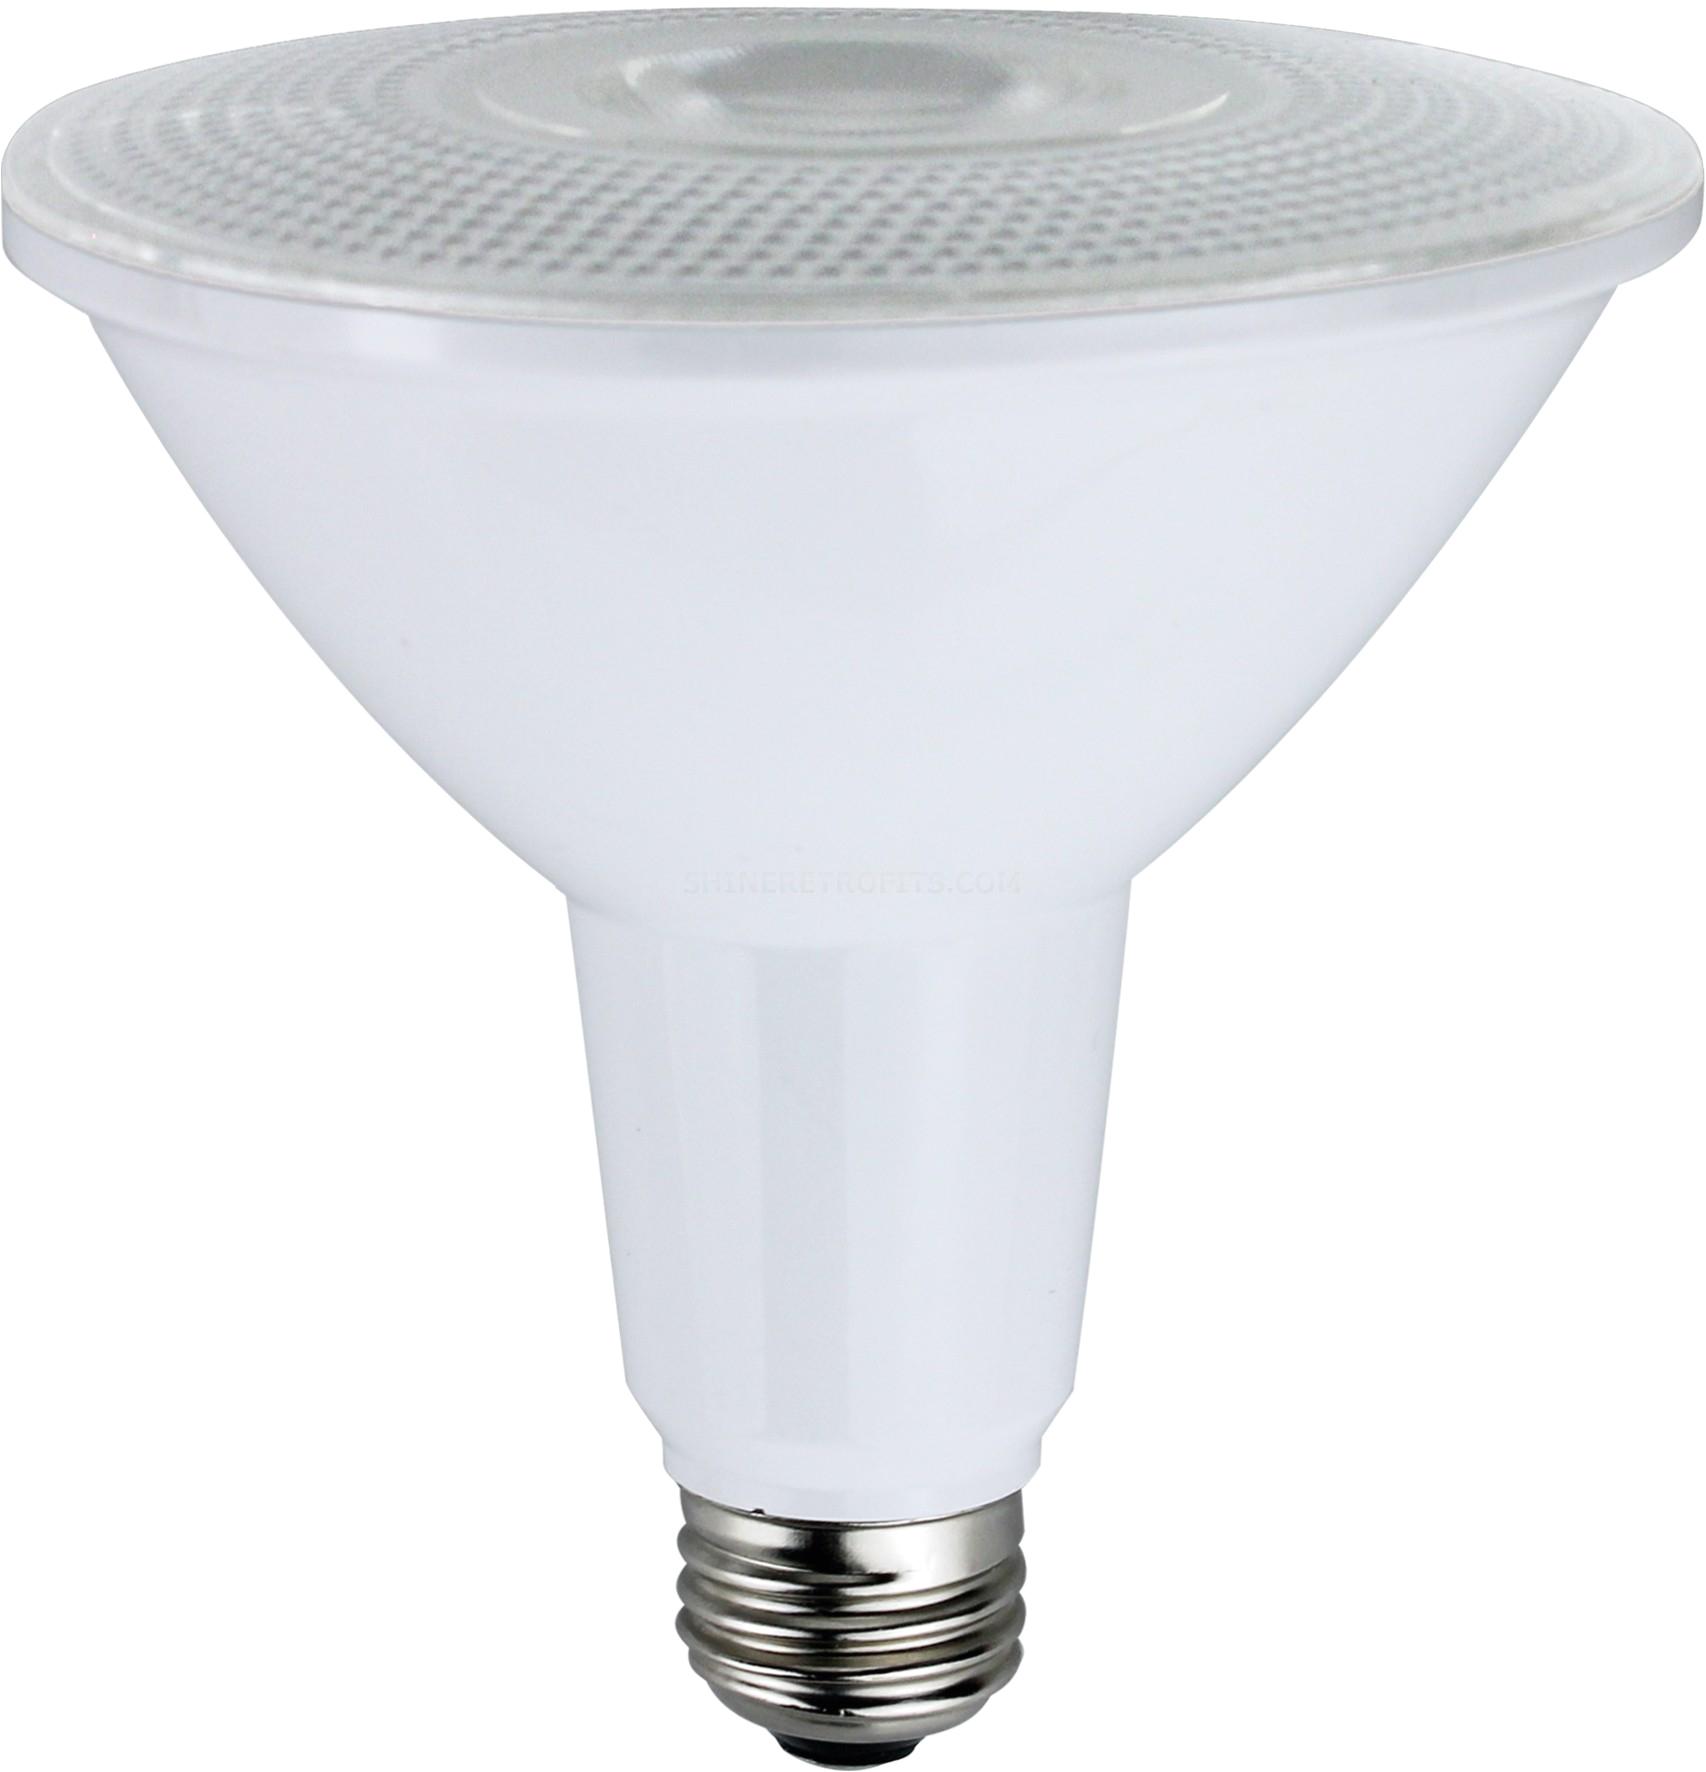 Lighting Stores Denver Naturaled Led15par38 Od 120l Fl Energy Star Certified 15 Watt Par38